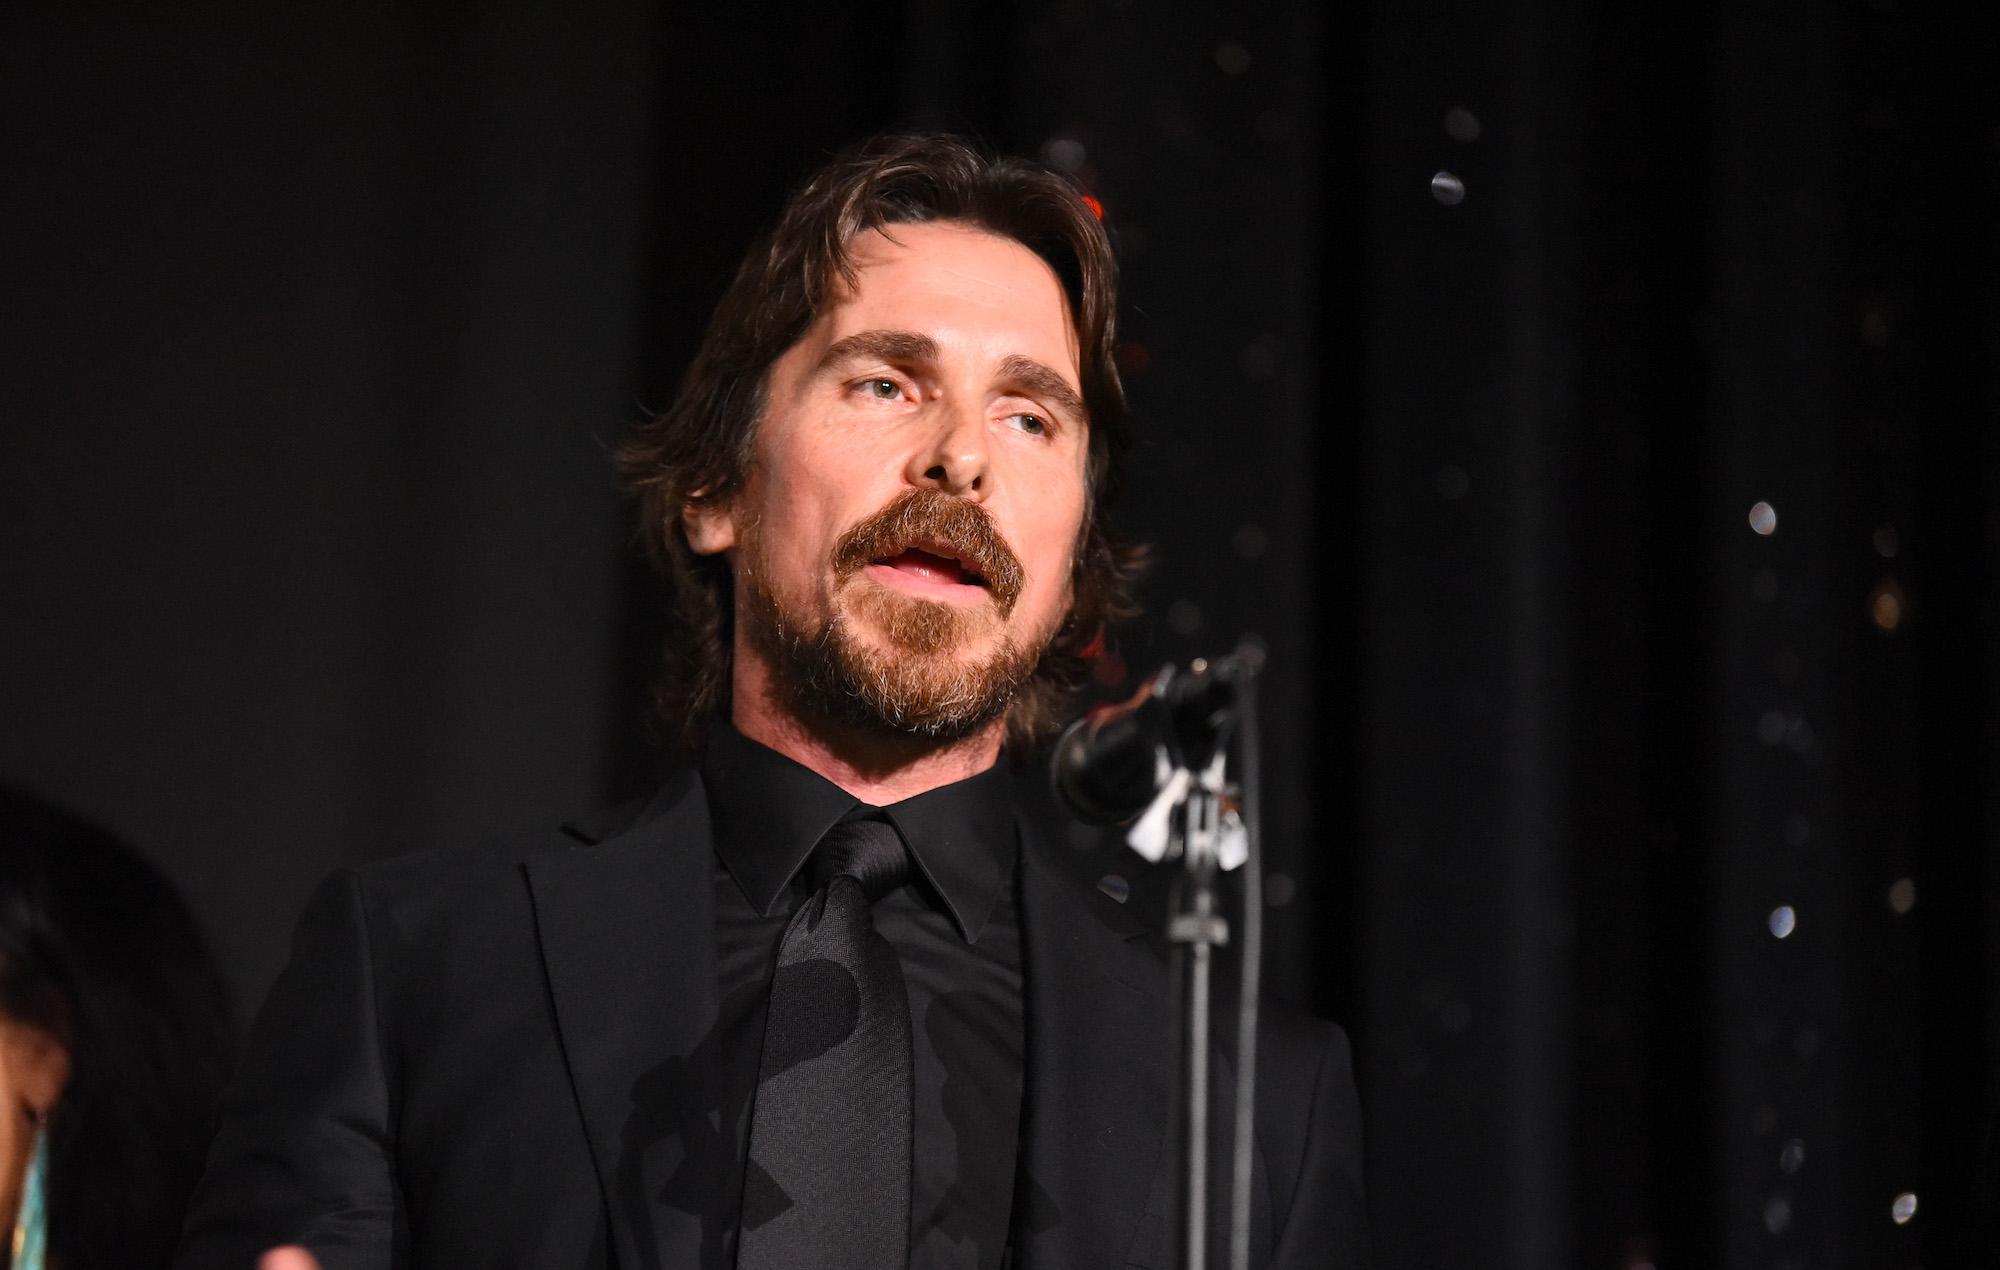 Netflix wins deal for Christian Bale horror thriller 'The Pale Blue Eye'